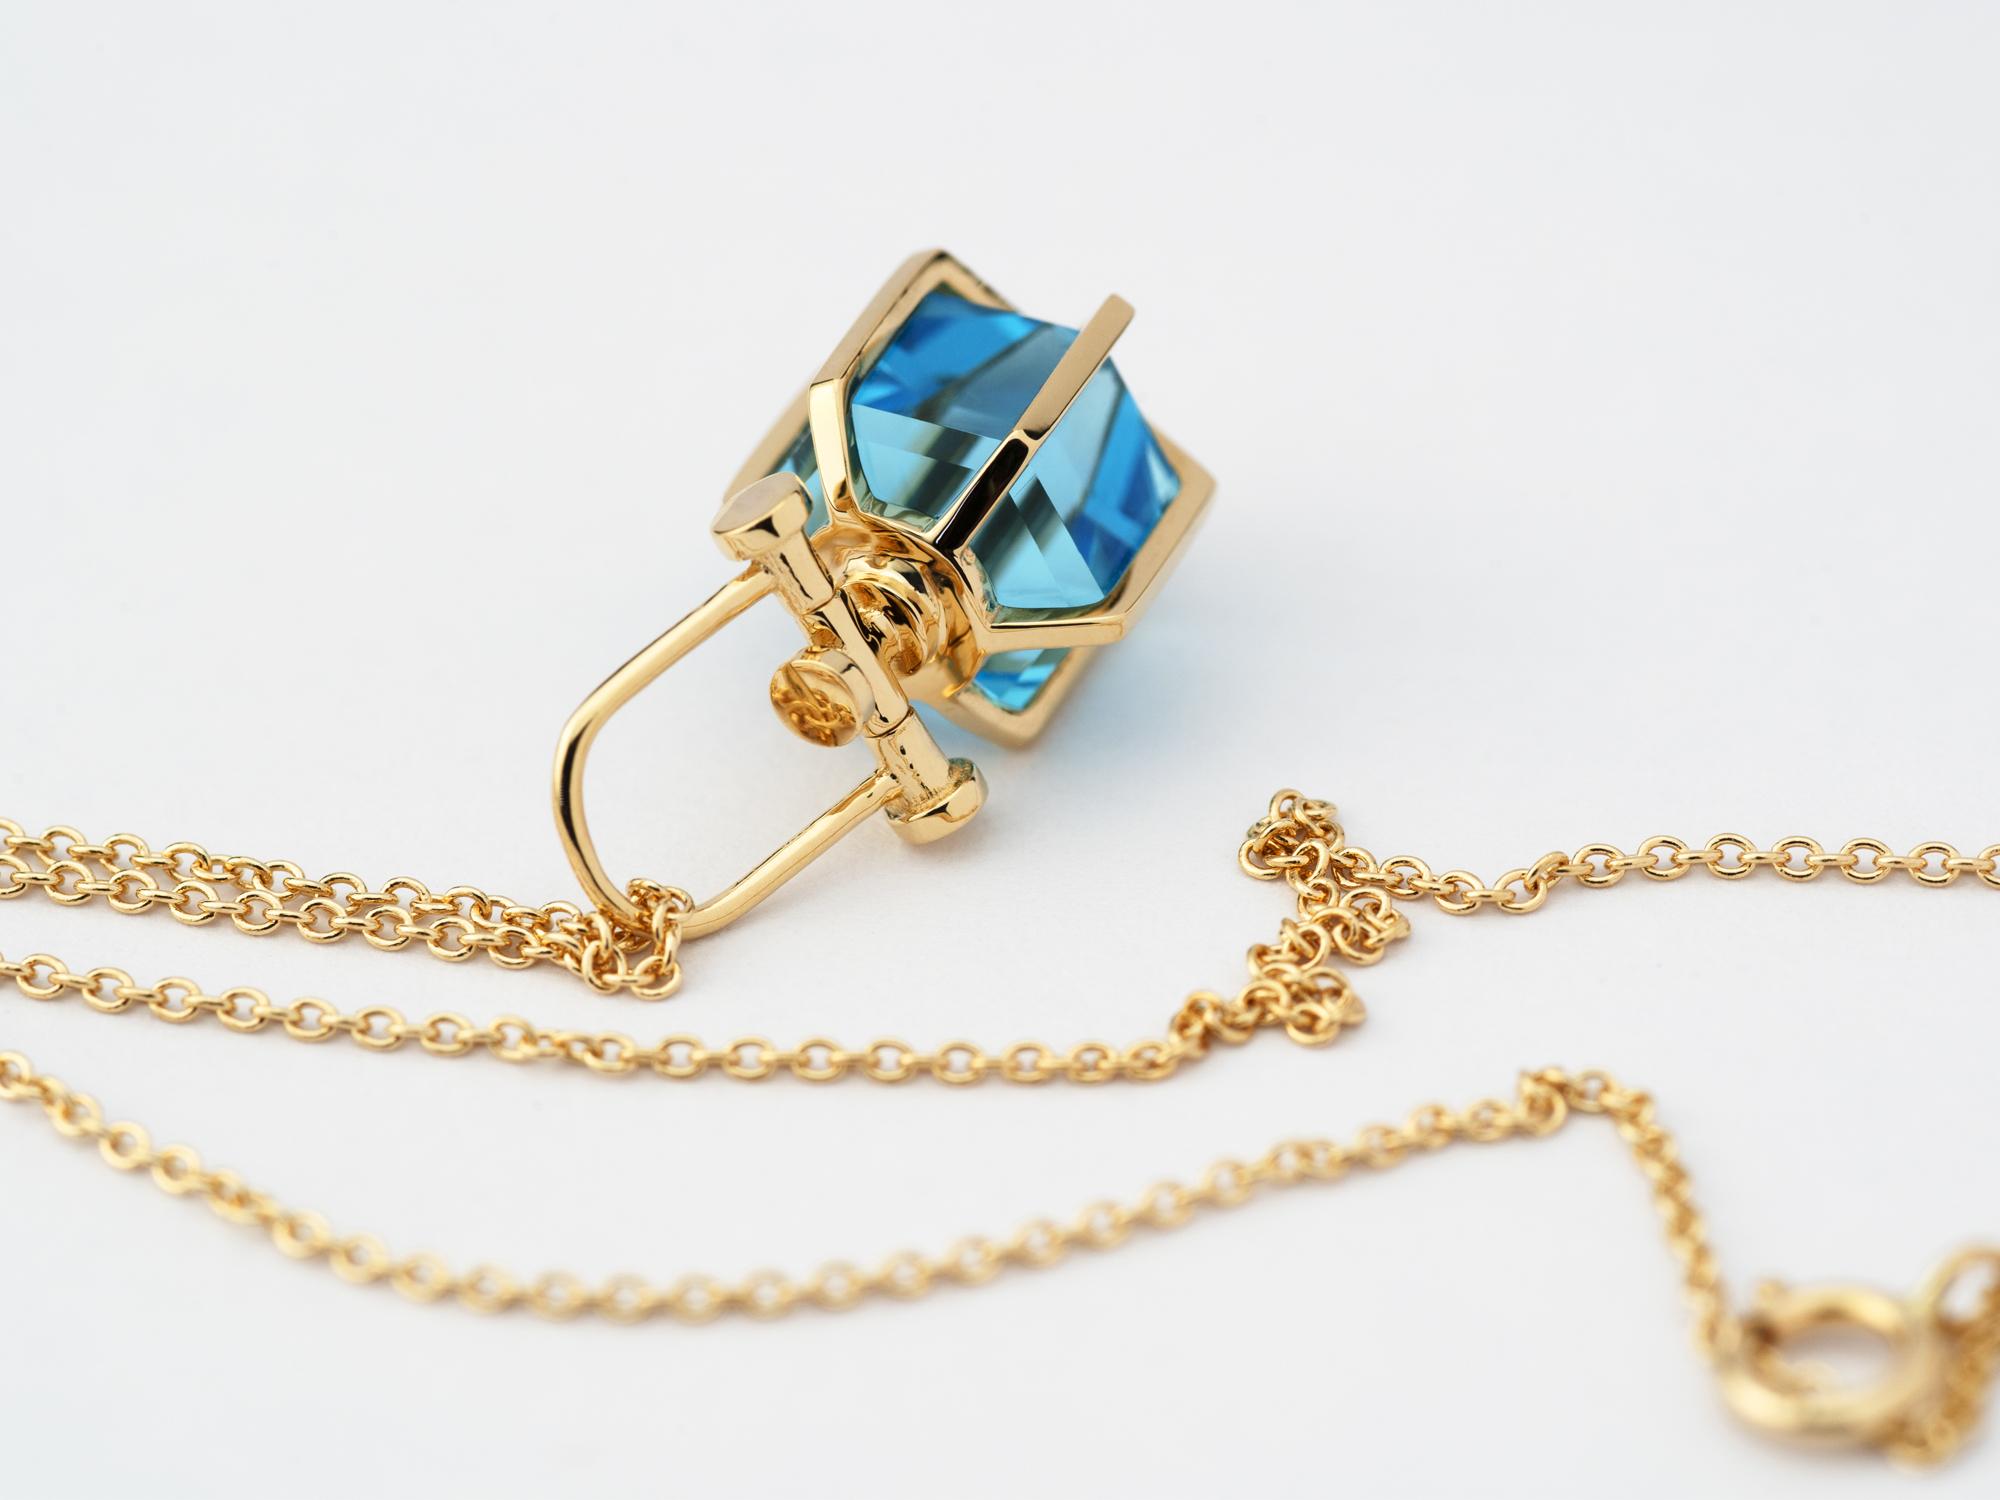 Mini Six Senses Talisman Pendant Necklace, 18k yellow gold with Swiss Blue Topaz